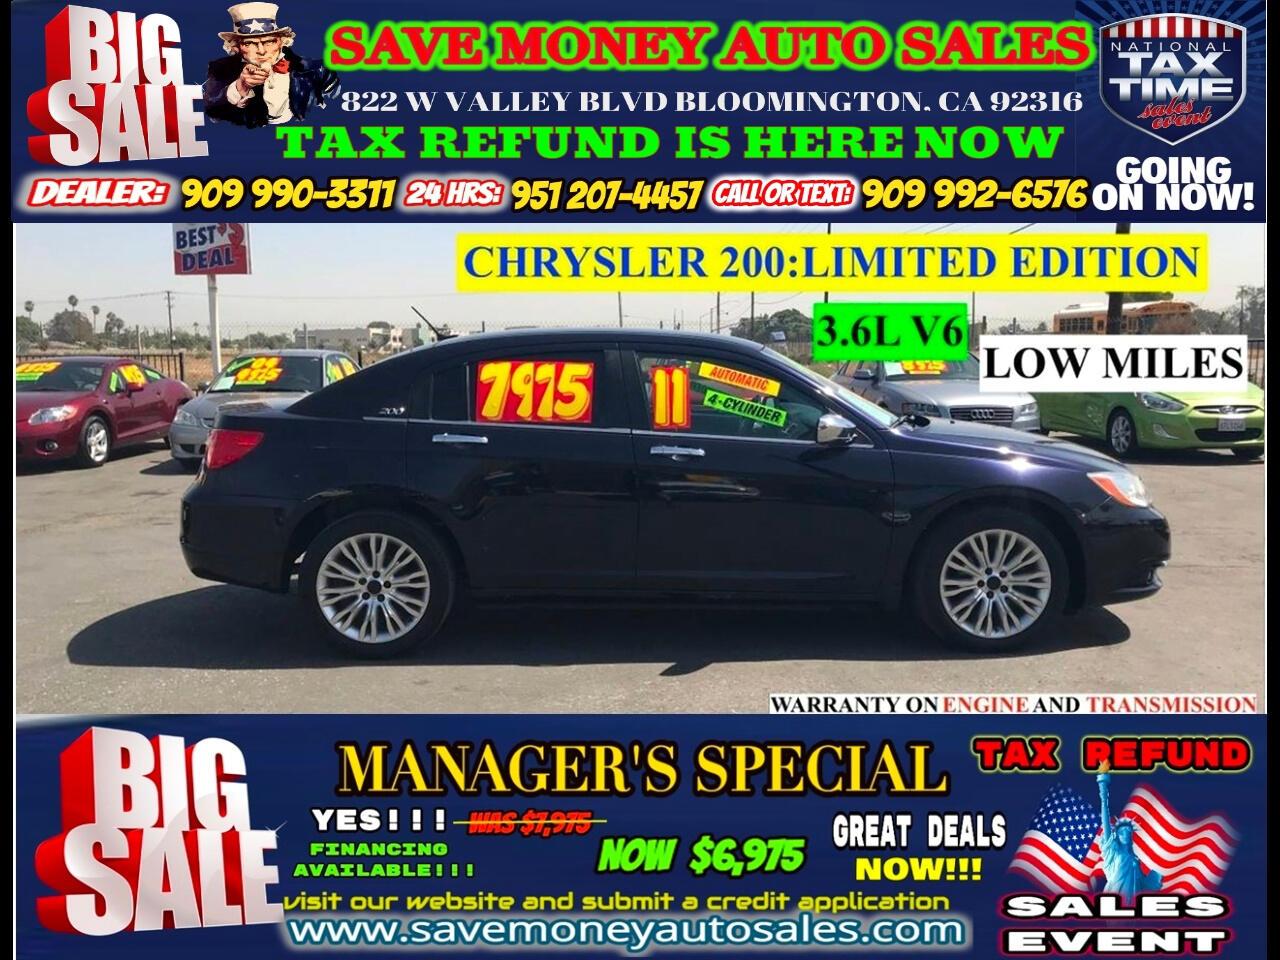 2011 Chrysler 200 LIMITED EDITION>>BLUETOOTH,NAVIGATION!!!!